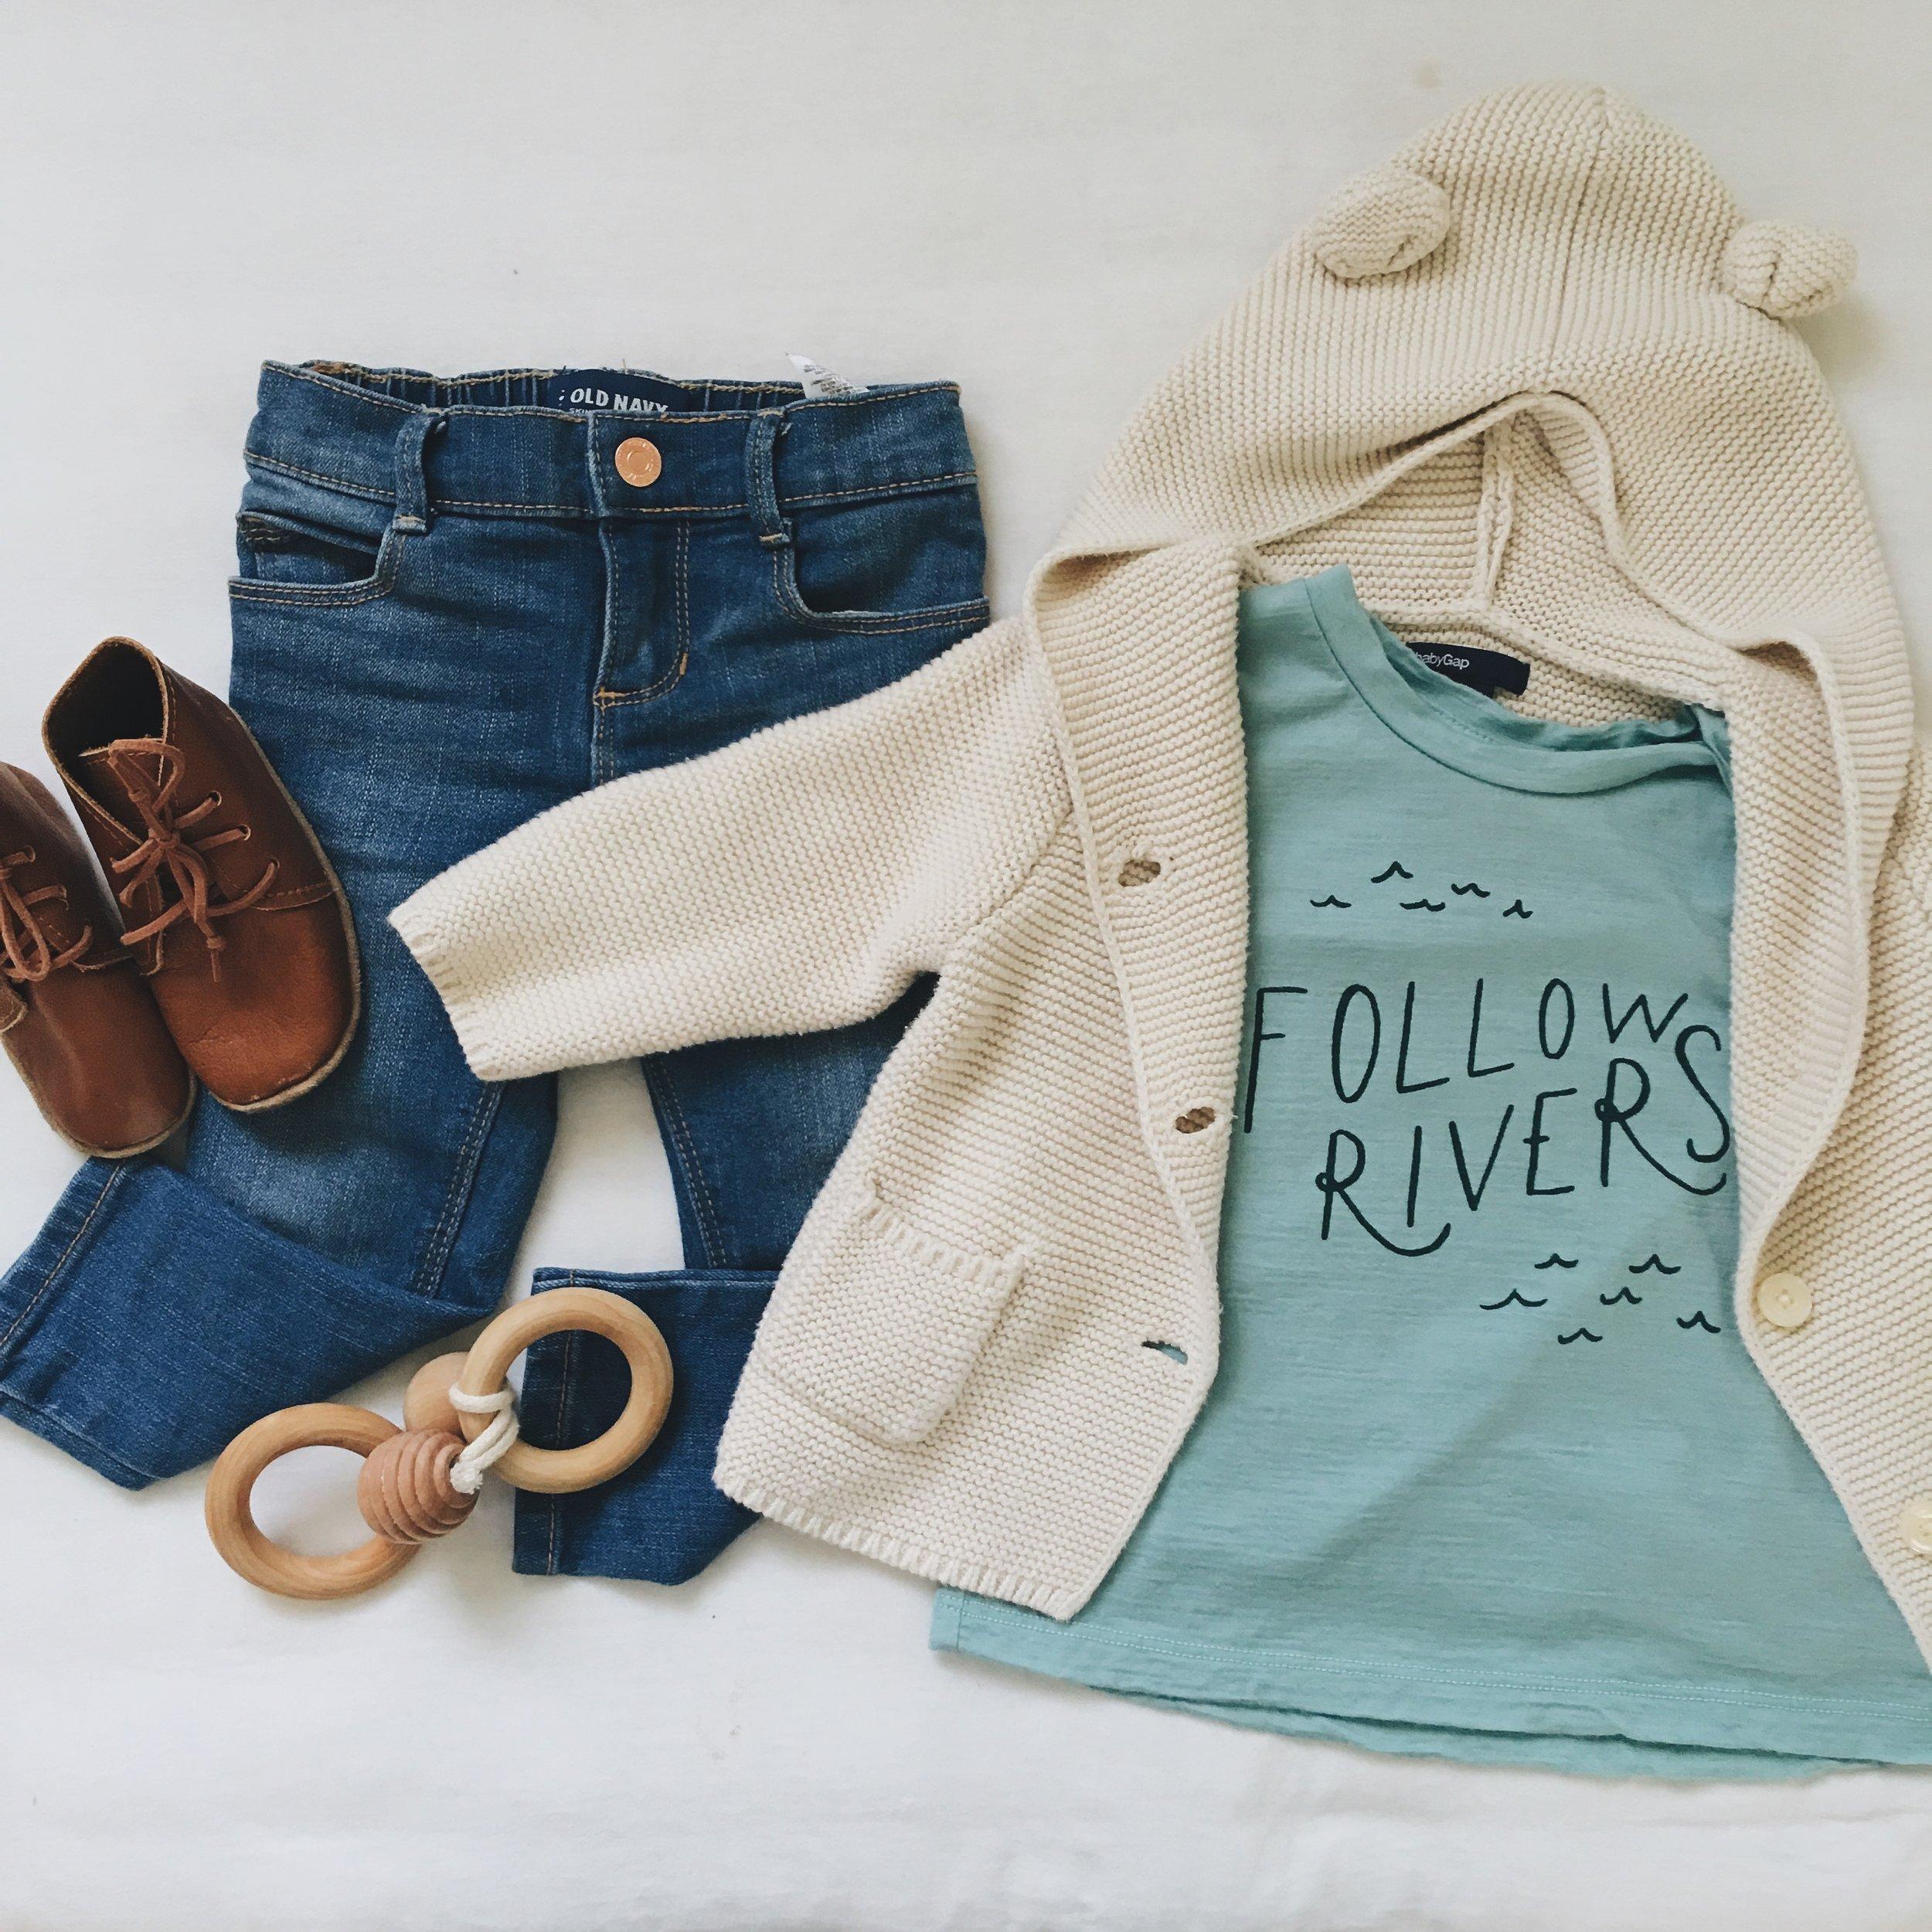 """Follow Rivers"" Tee c/o  Chasing Windmills  ;  Sweater  - Gap; Jeans -  Old Navy  (girl's department) ;  Leather Booties  c/o  Ulla + Viggo  ;  Bee Teether  c/o  Wild Creek Co"